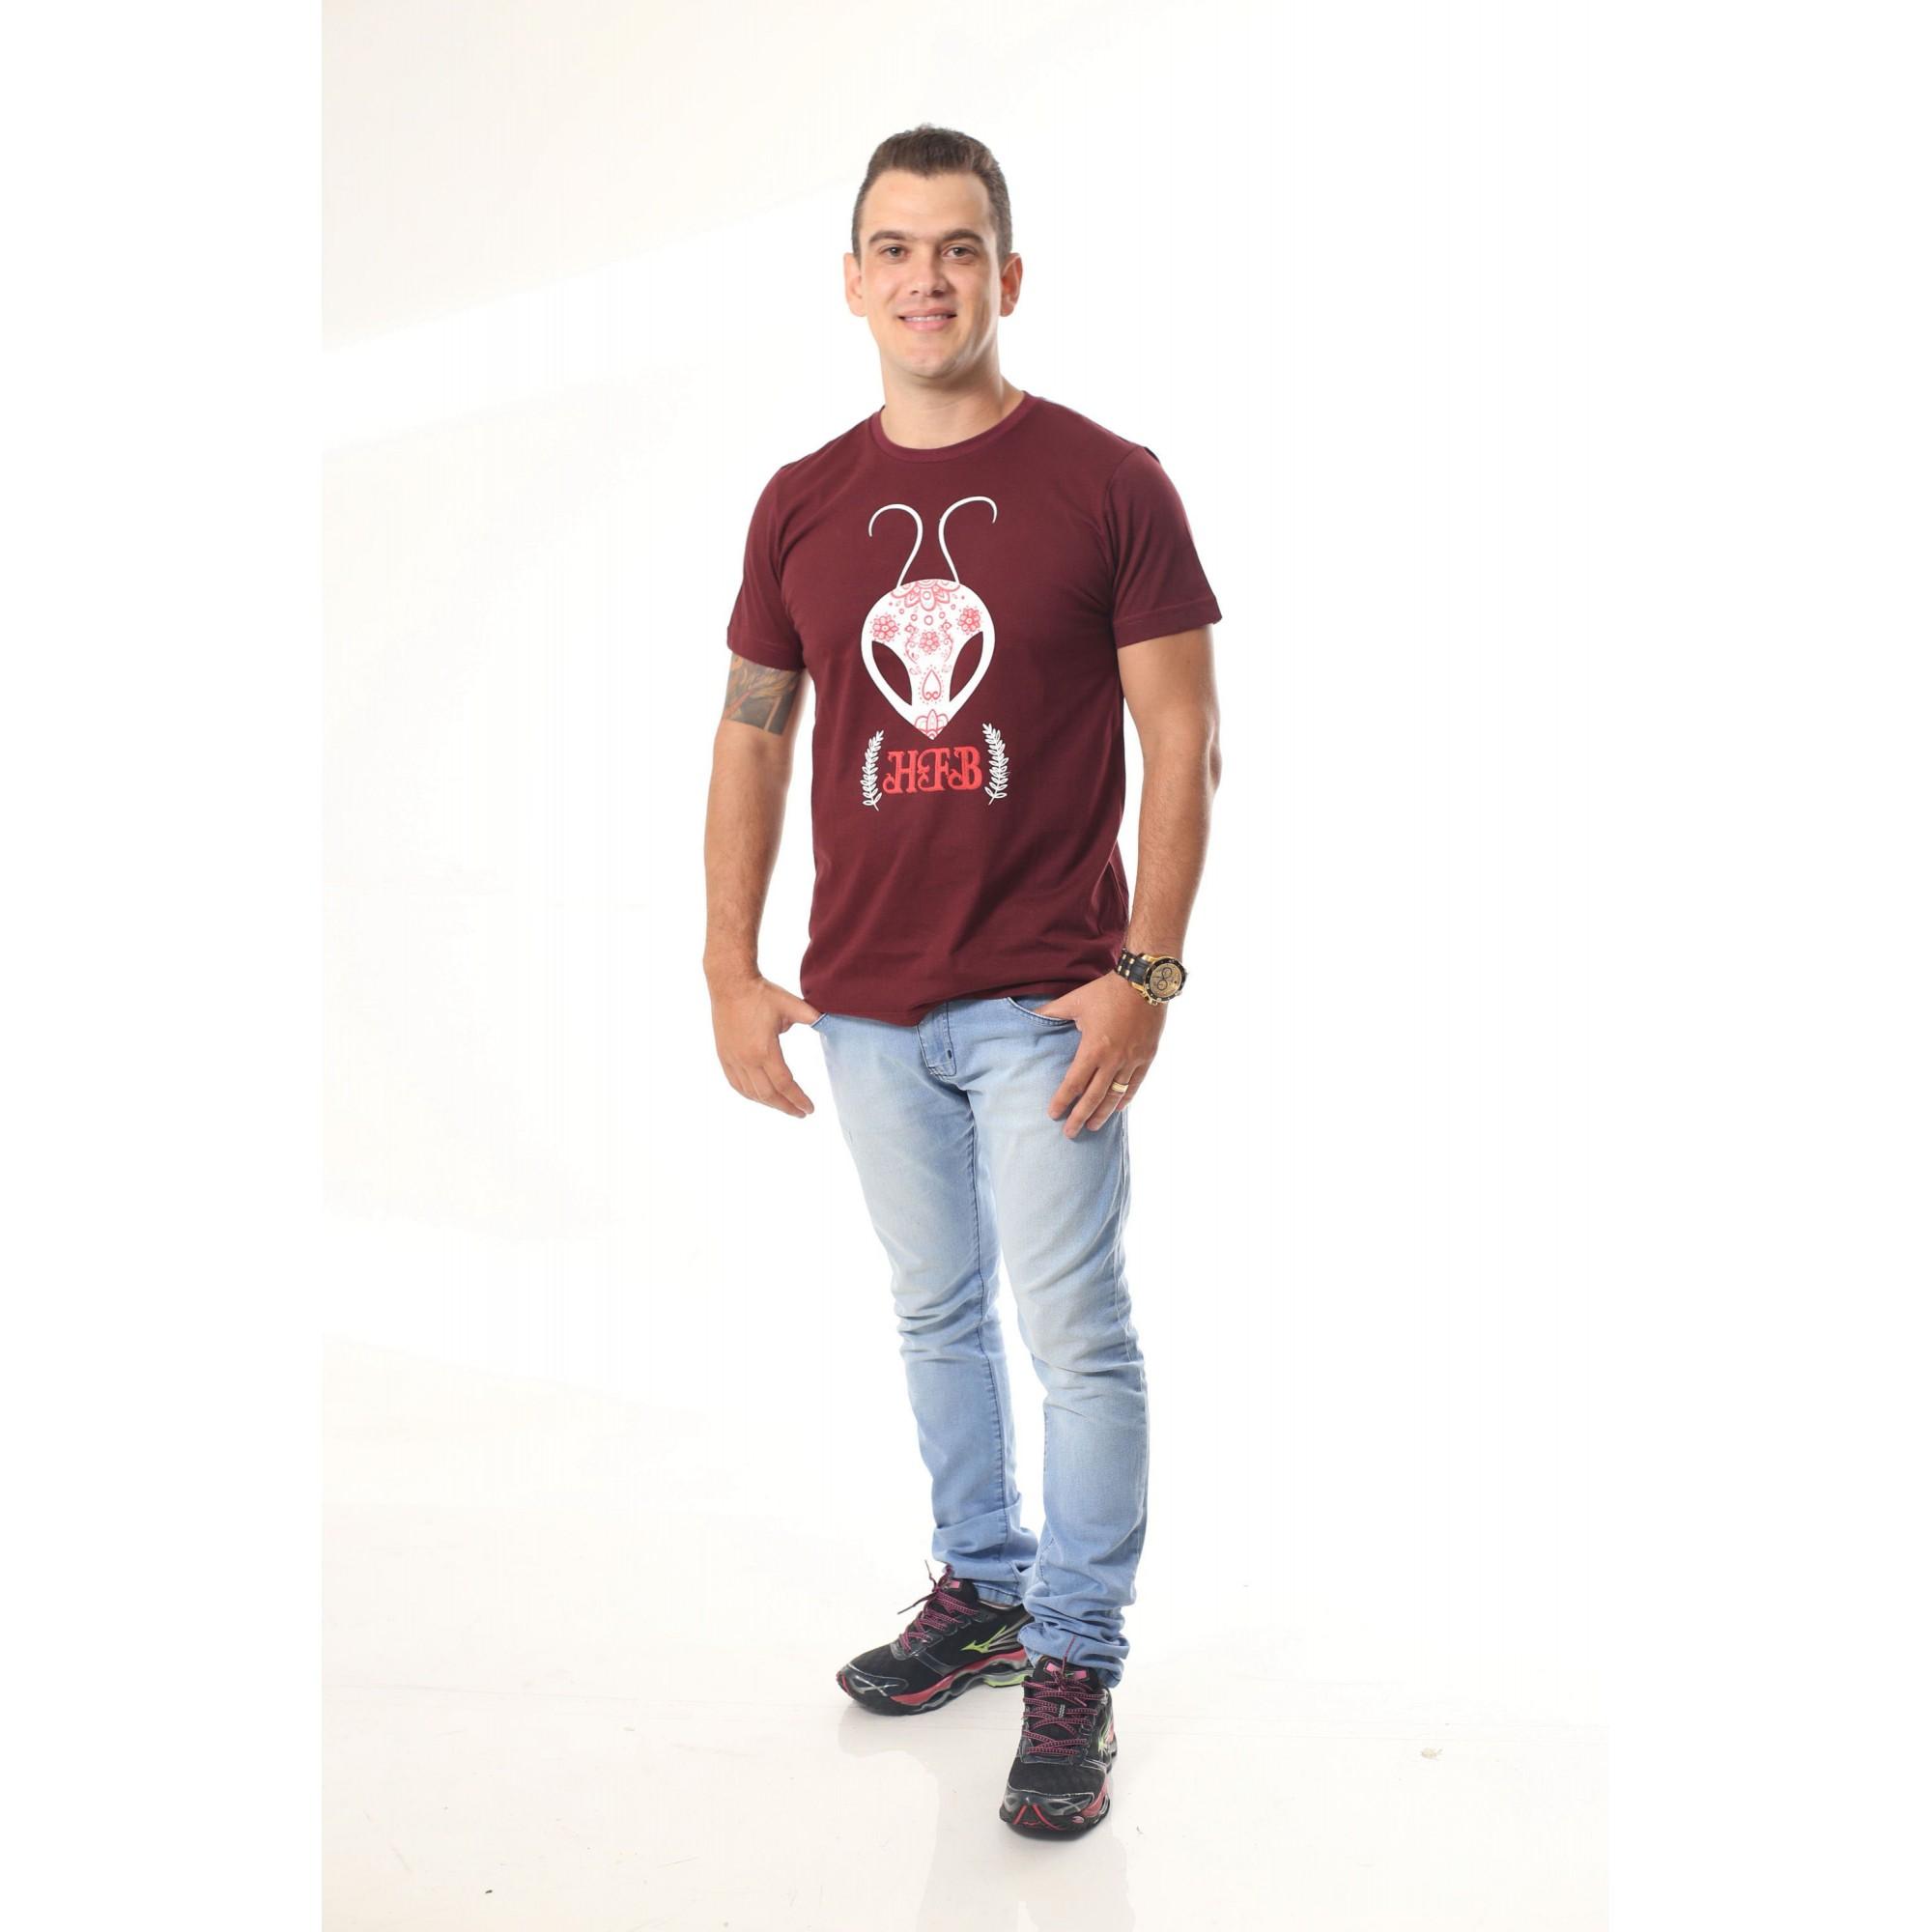 Camiseta Bordo Formiga  - Heitor Fashion Brazil